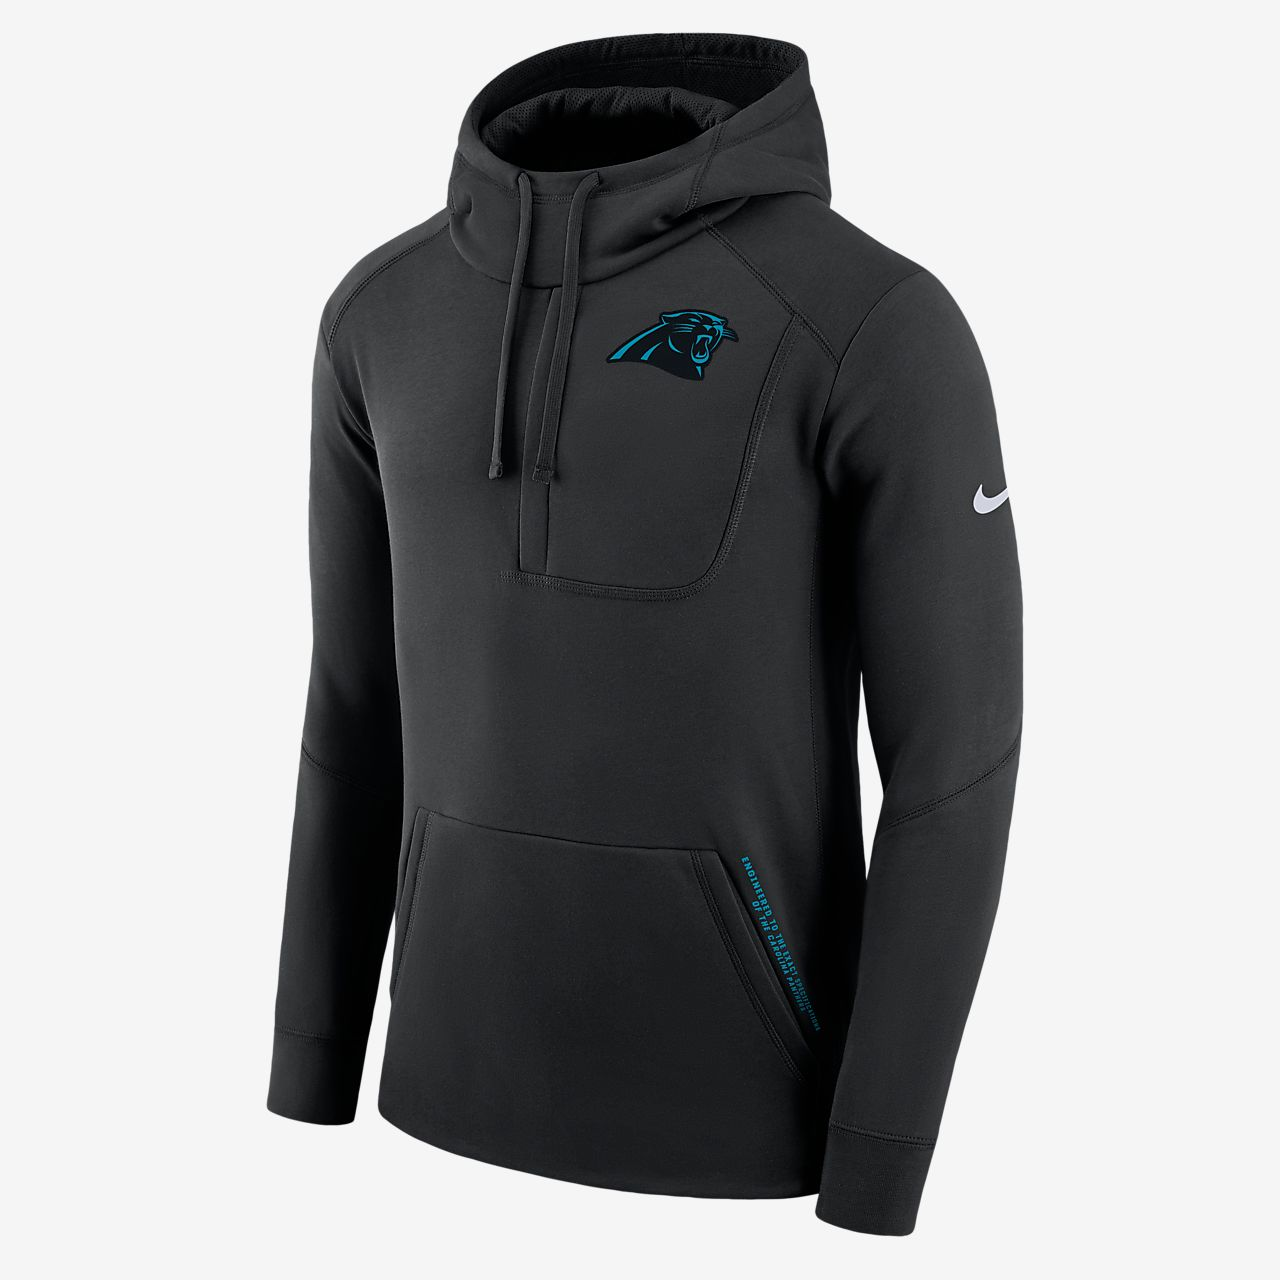 Sweat à capuche Nike Fly Fleece (NFL Panthers) pour Homme